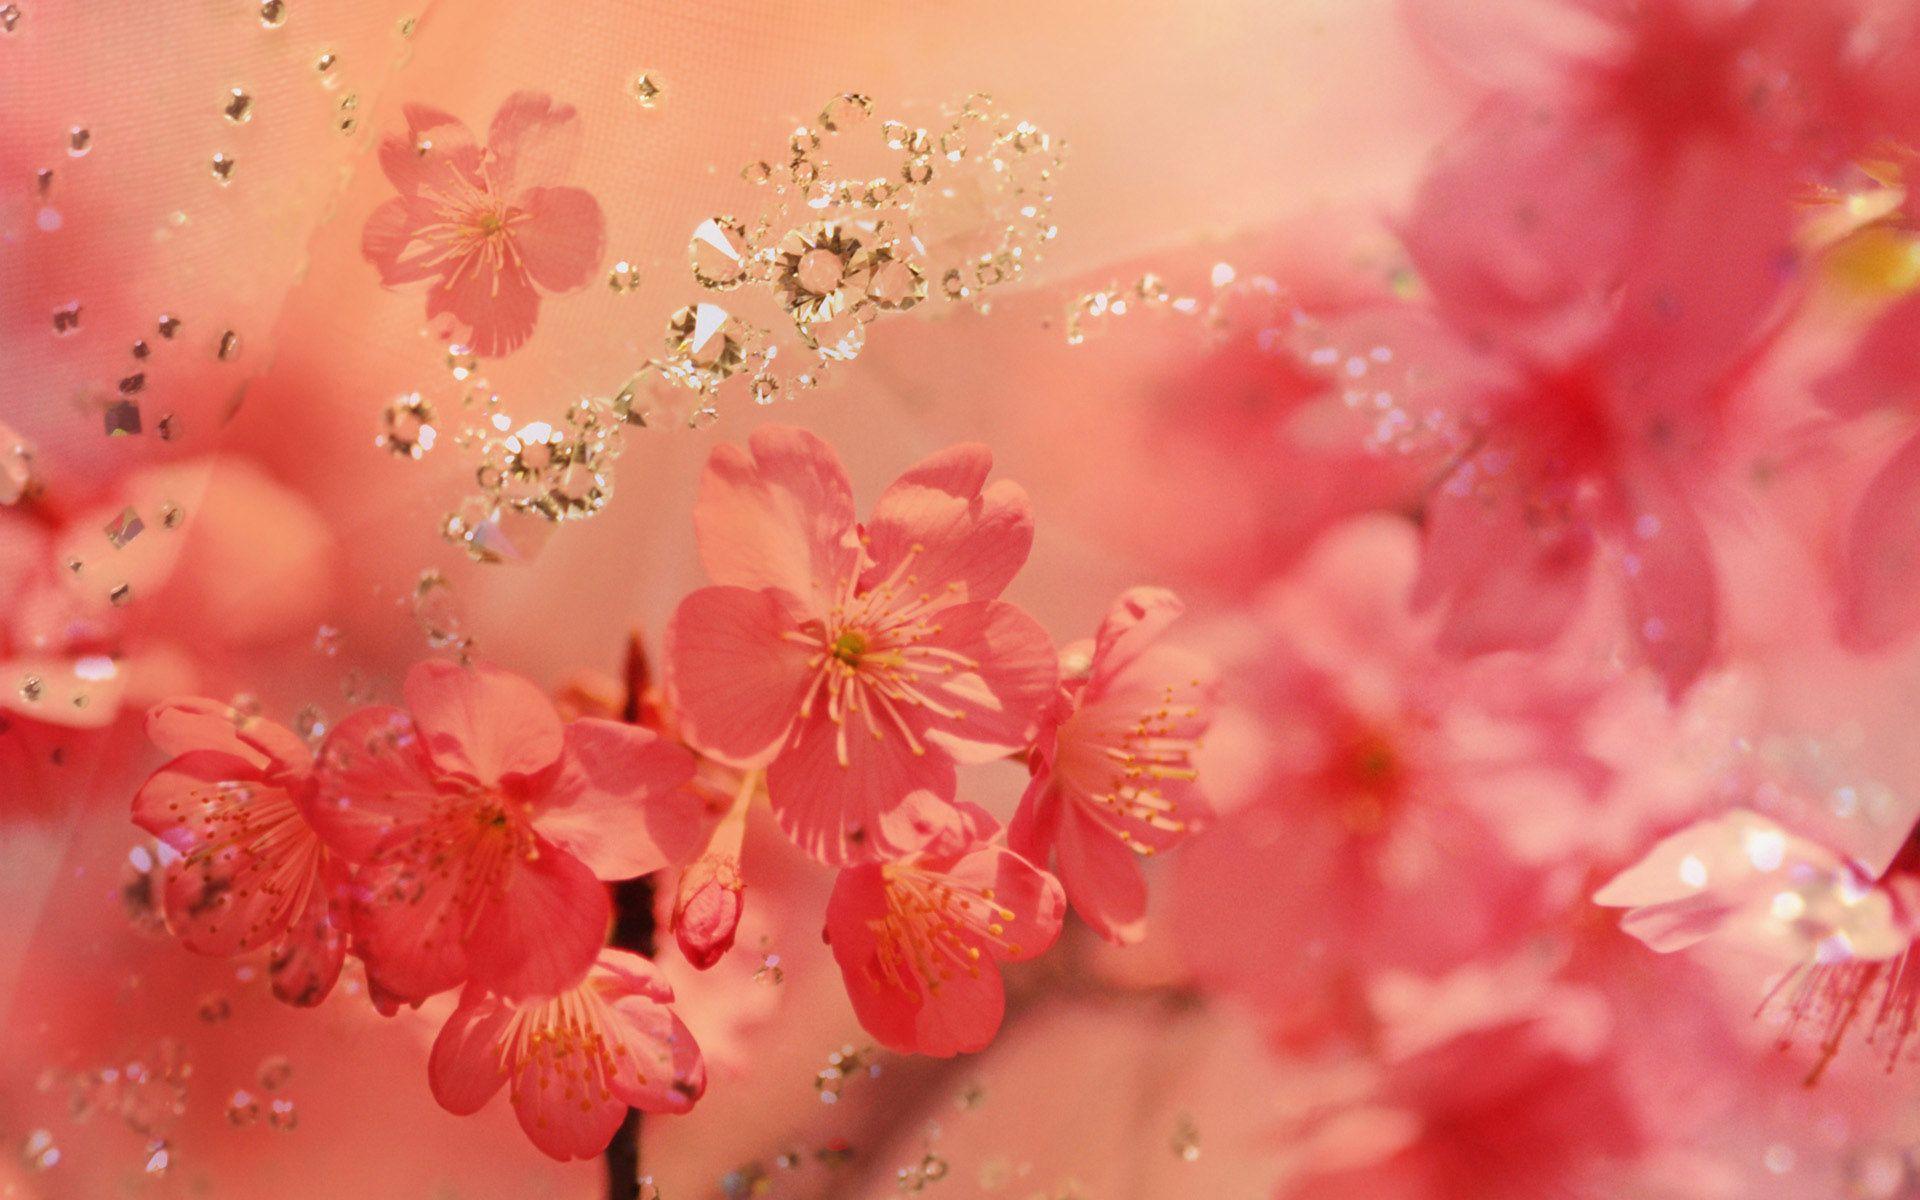 Flowers wallpapers hd widescreen 1 flowers wallpapers hd widescreen flowers wallpapers hd widescreen 1 flowers wallpapers hd widescreen mightylinksfo